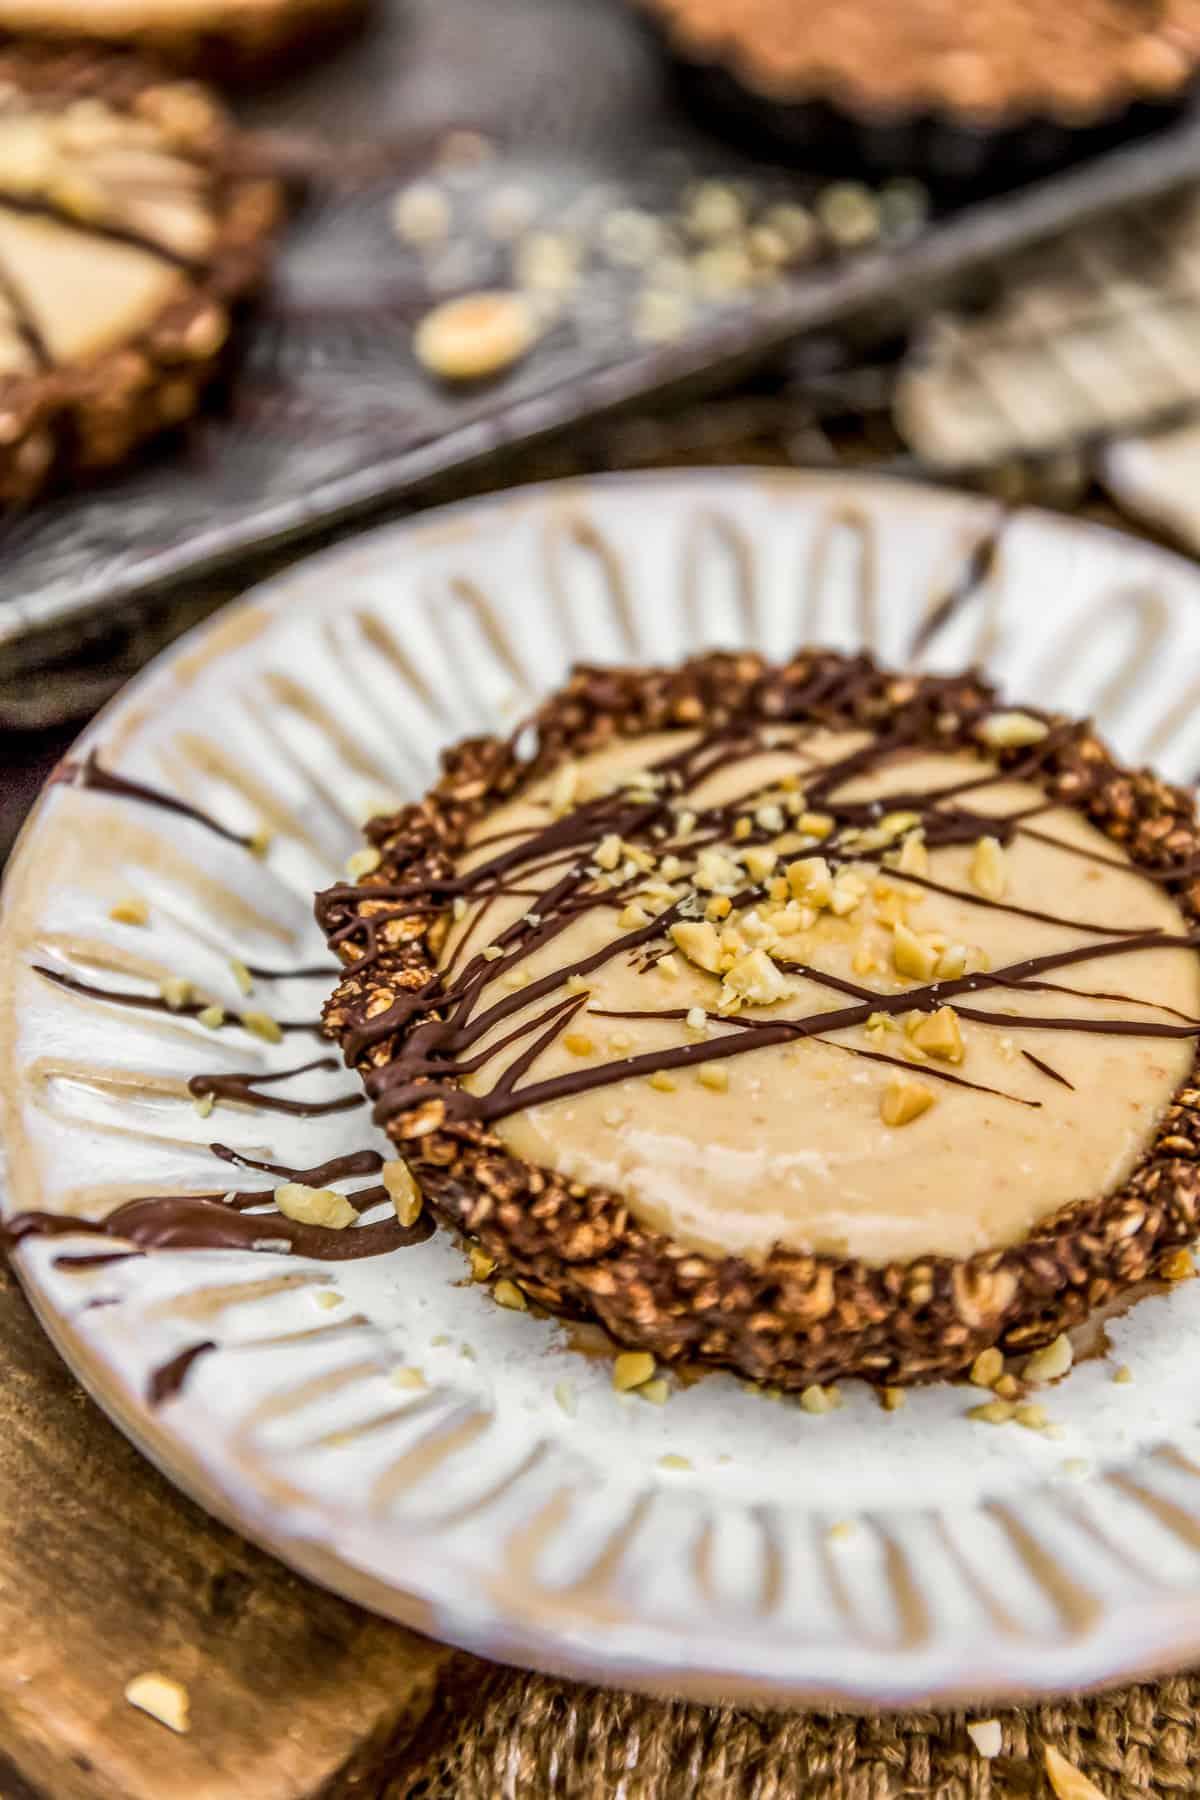 Vegan Peanut Butter Pie on a plate